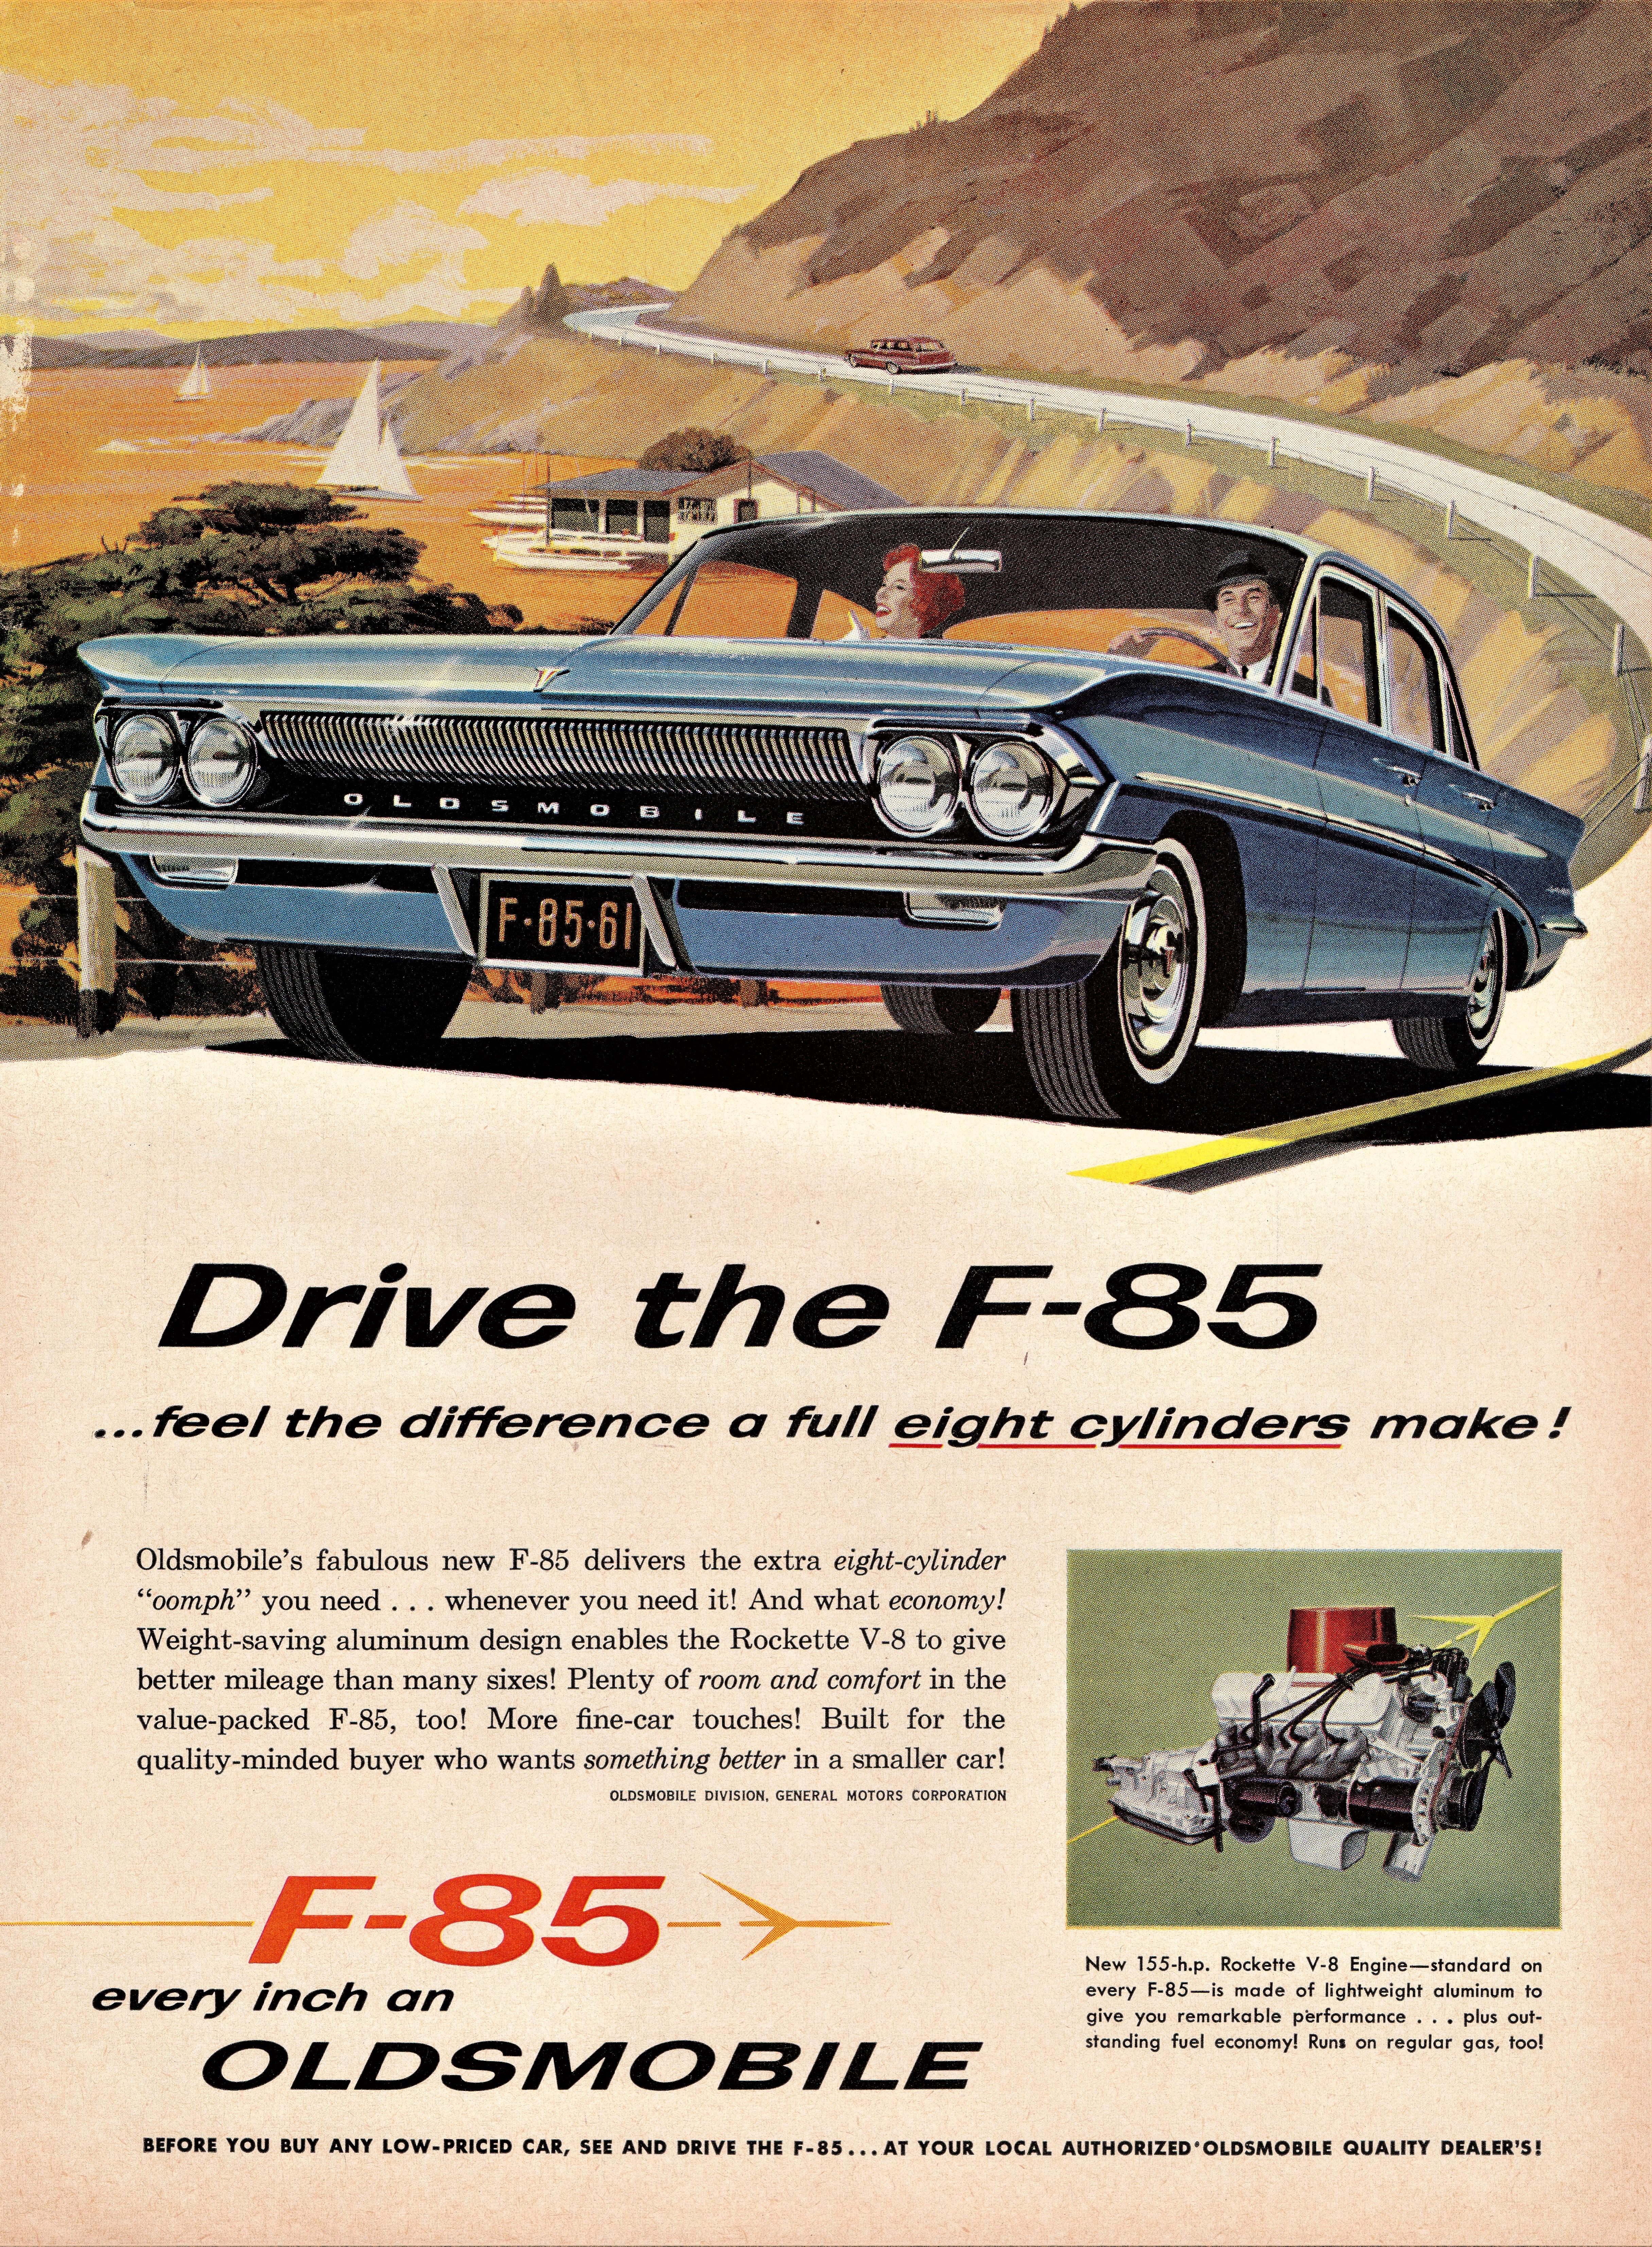 1961 Oldsmobile F-85 4-Door Sedan